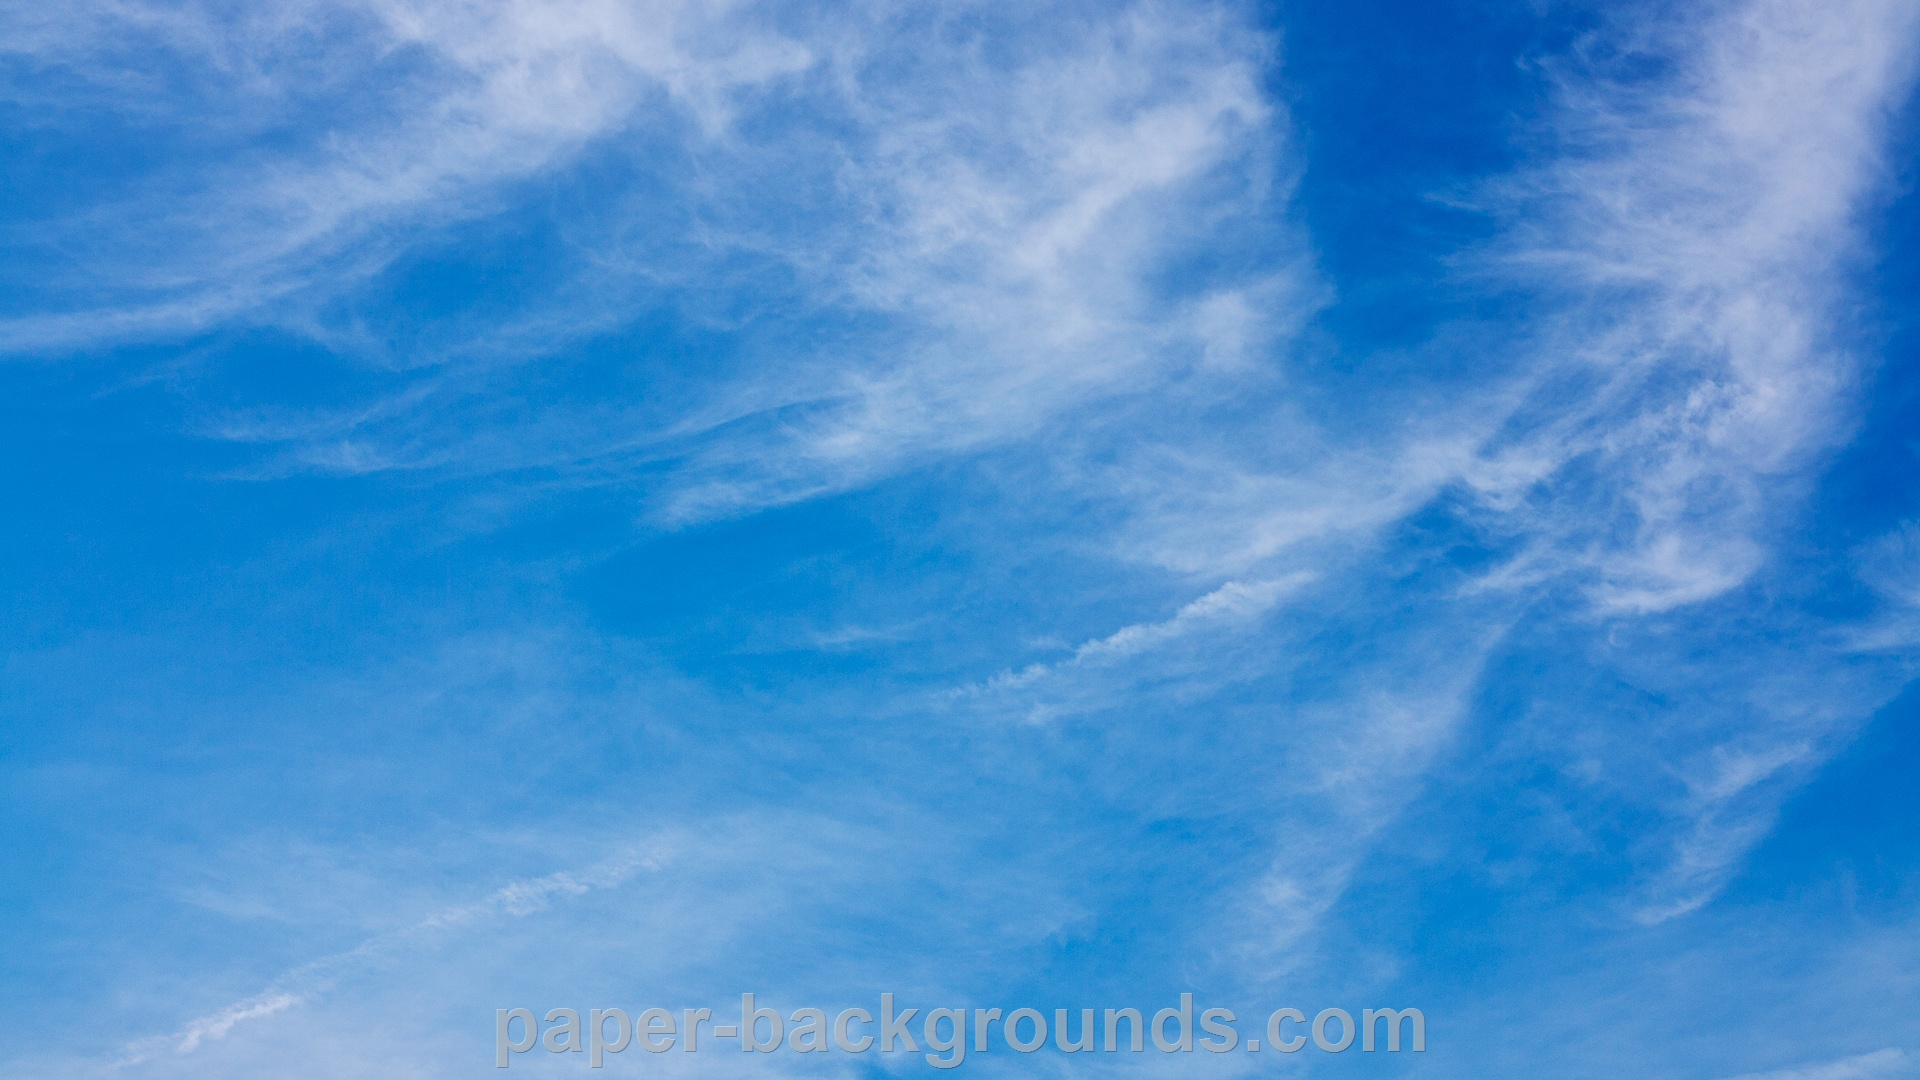 Sky Background Images - WallpaperSafari